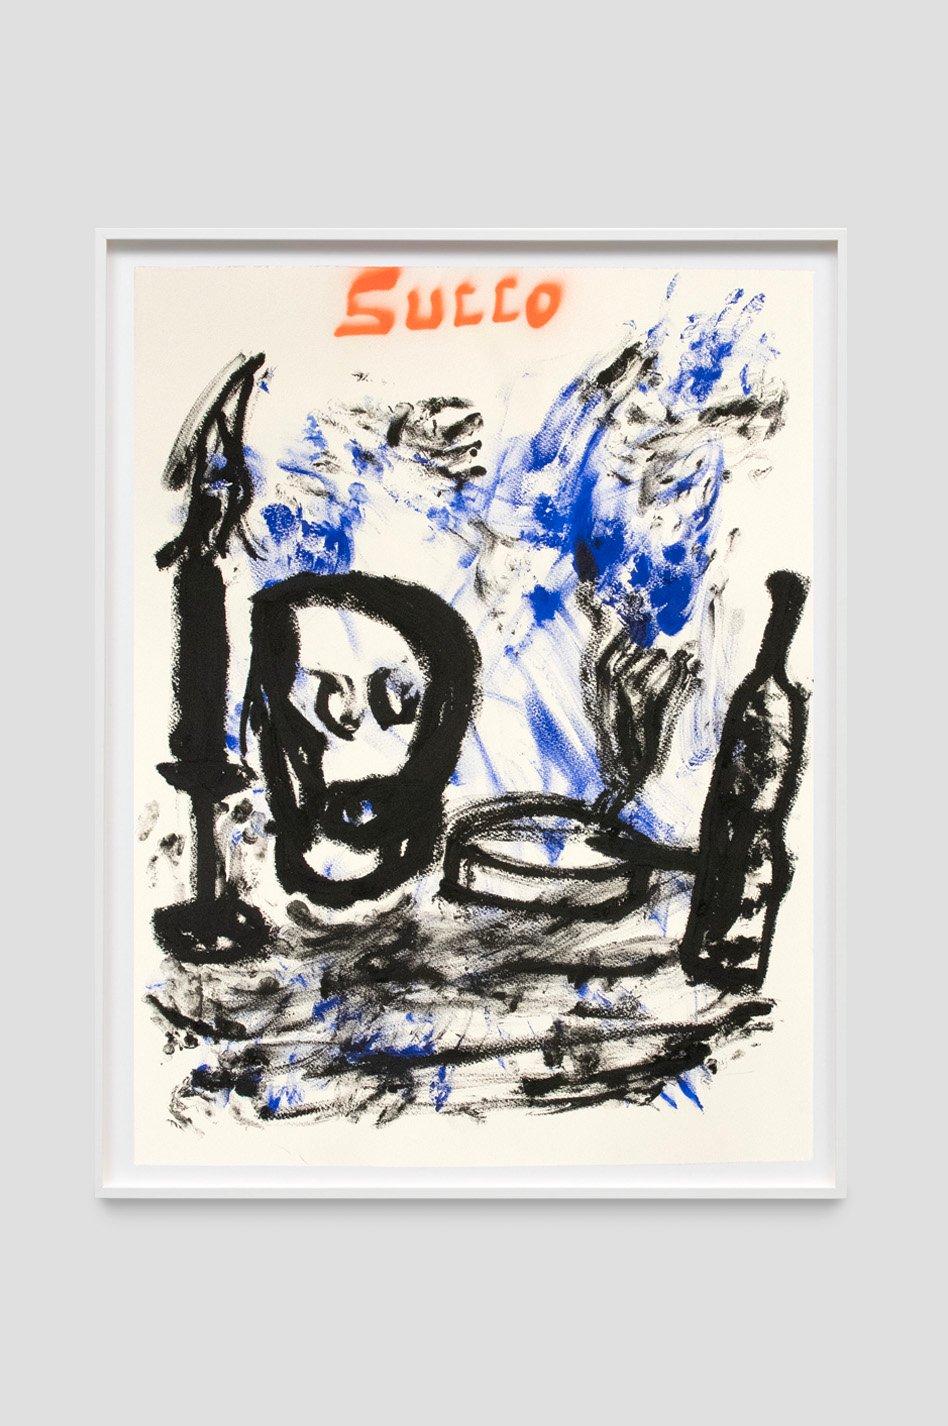 Image of Chris Succo - Untitled (3)